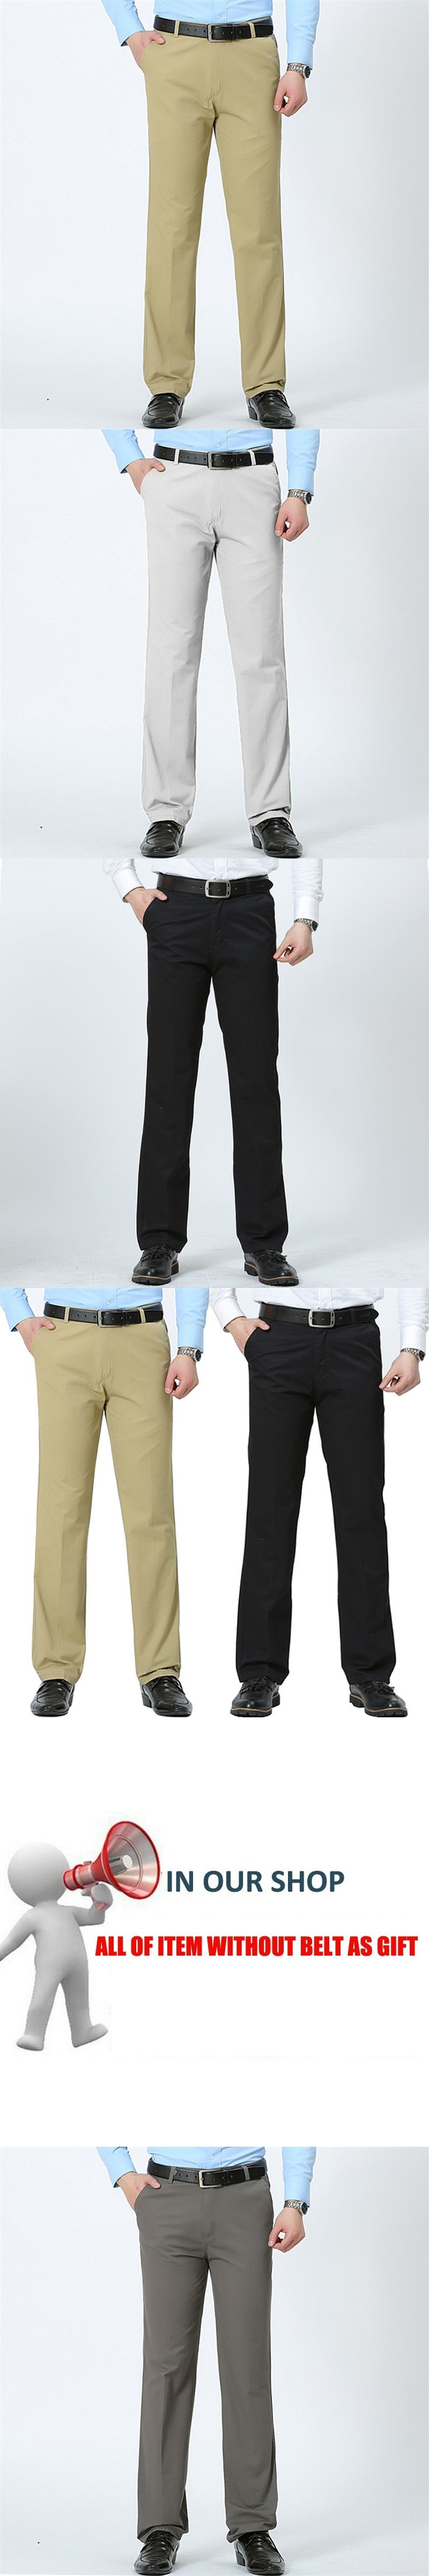 2017 Men Casual Army Pants Brand Big Size Pants Business Straight Trousers Mens Cotton Summer Pants Khaki Pant For Man no belts